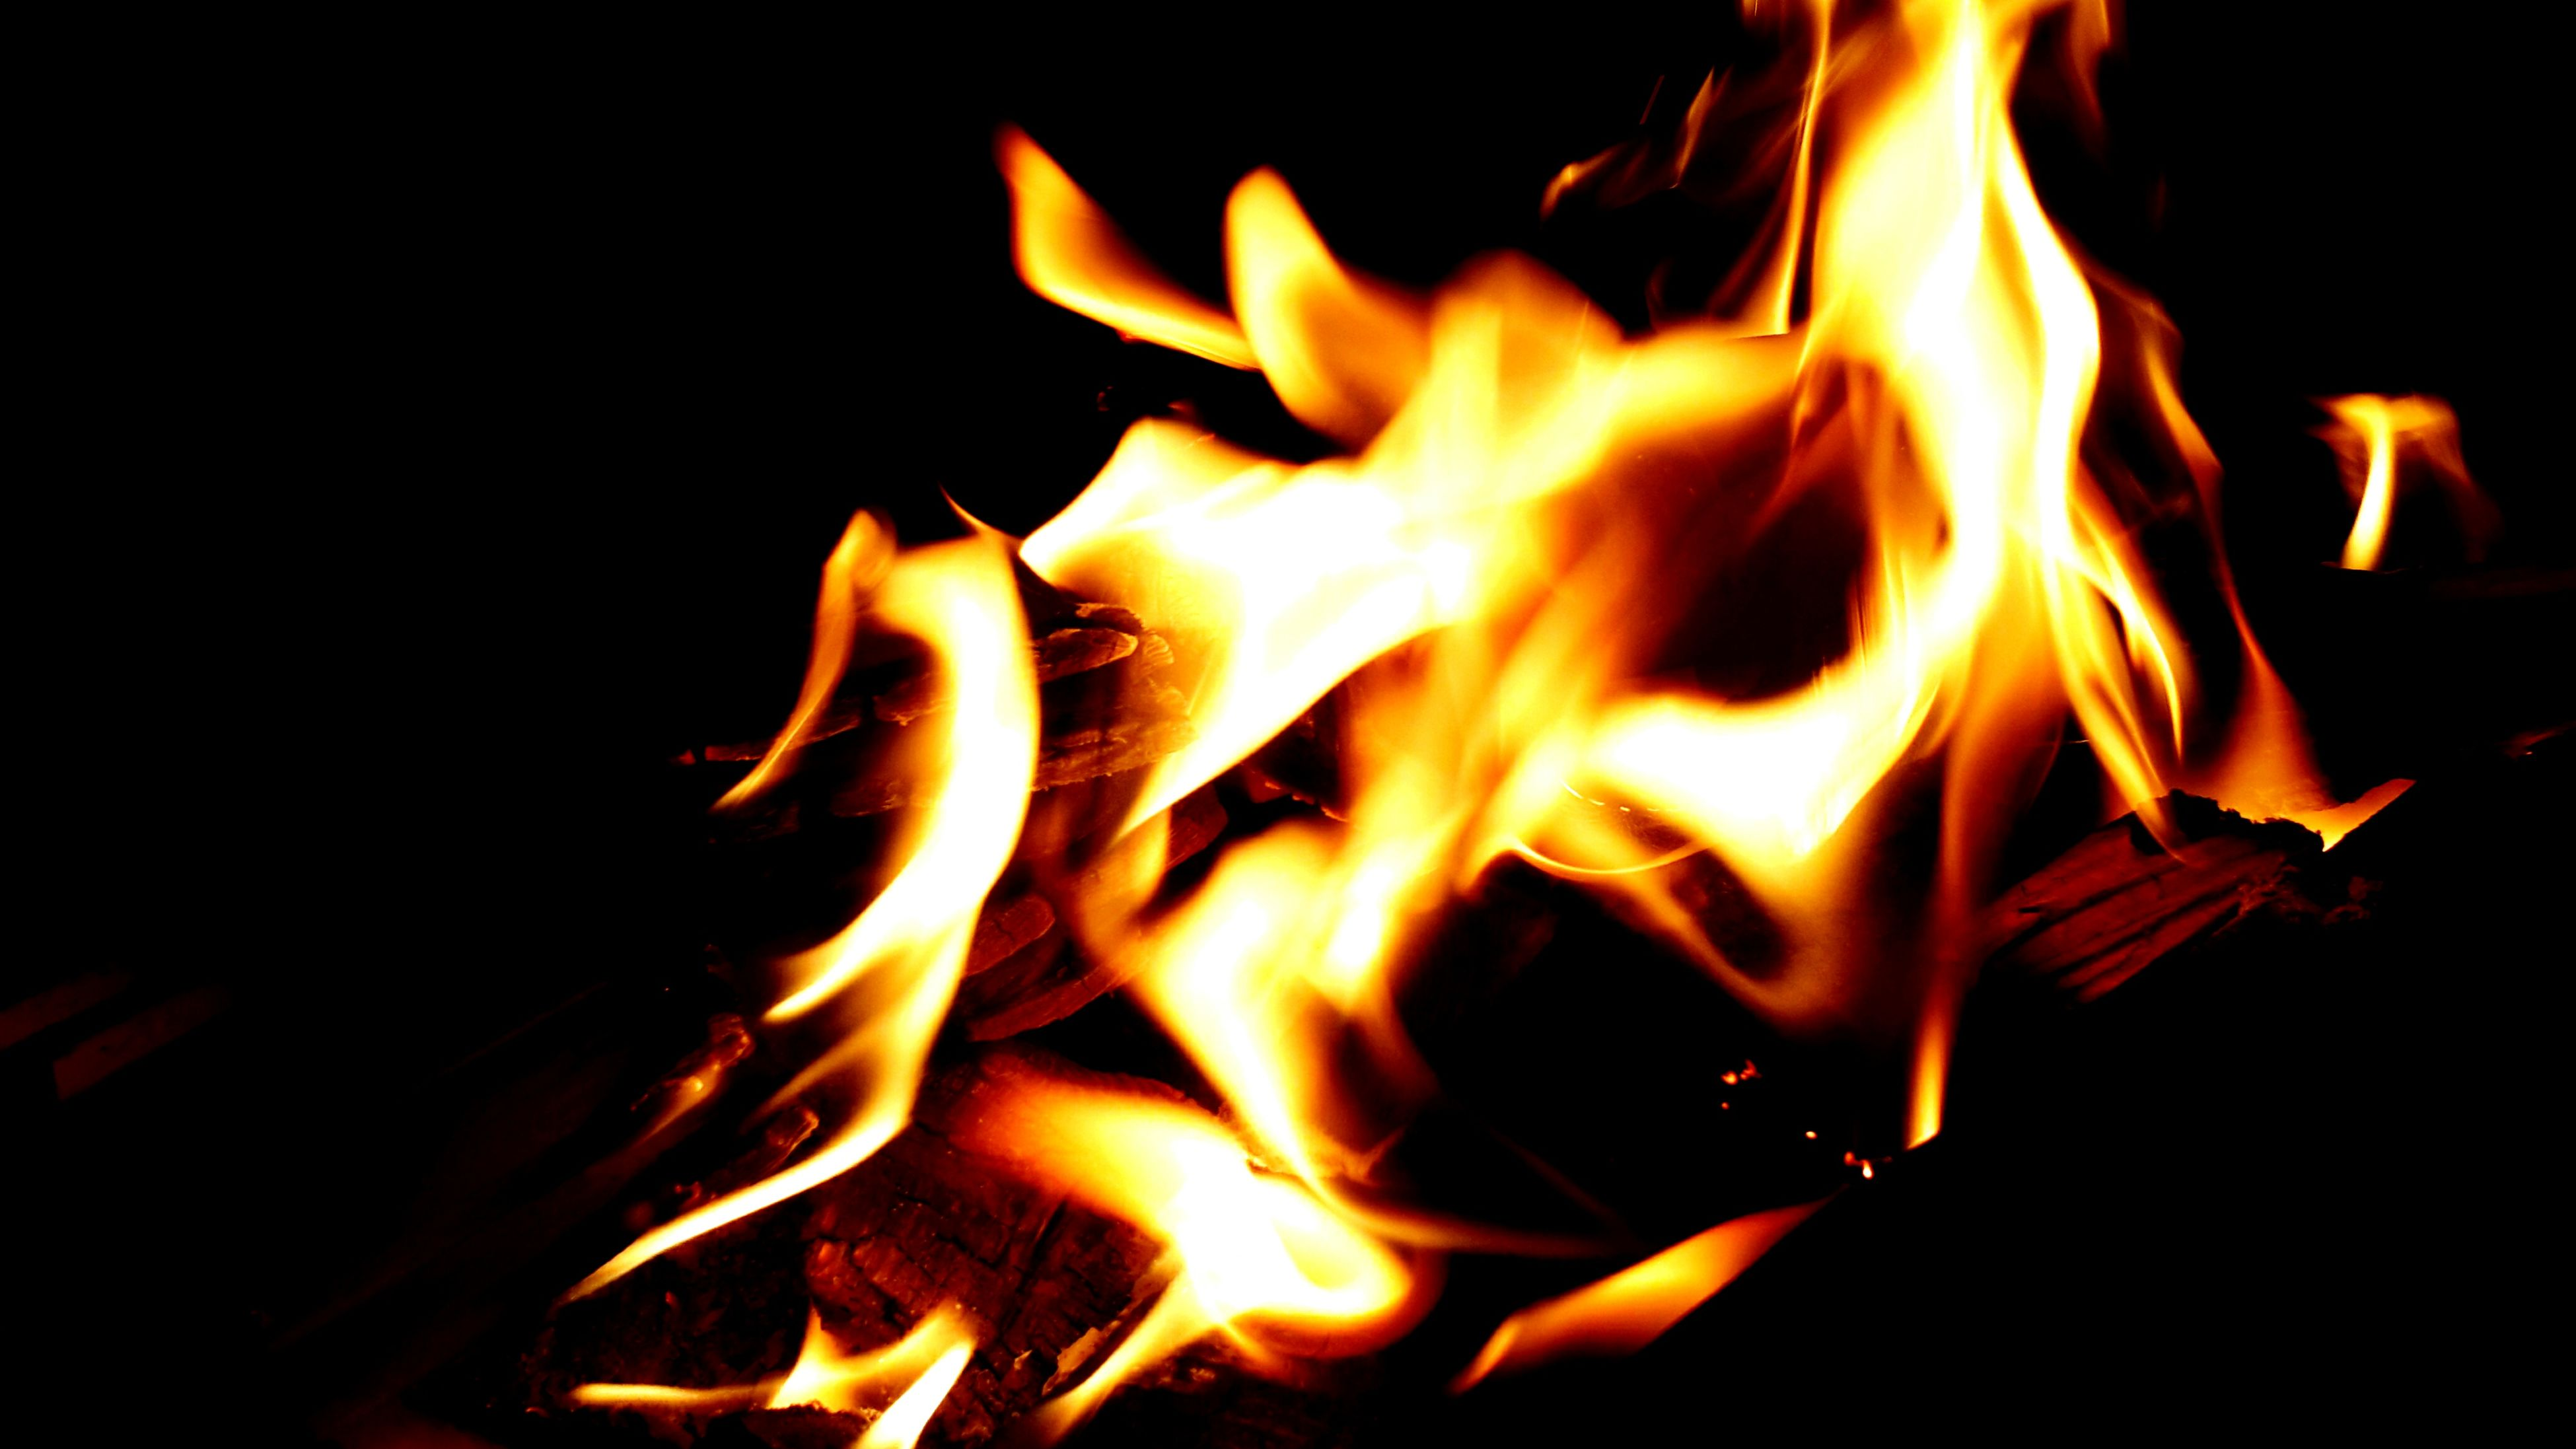 burning, flame, fire - natural phenomenon, heat - temperature, glowing, night, bonfire, close-up, fire, firewood, orange color, illuminated, heat, campfire, dark, studio shot, motion, black background, lit, light - natural phenomenon